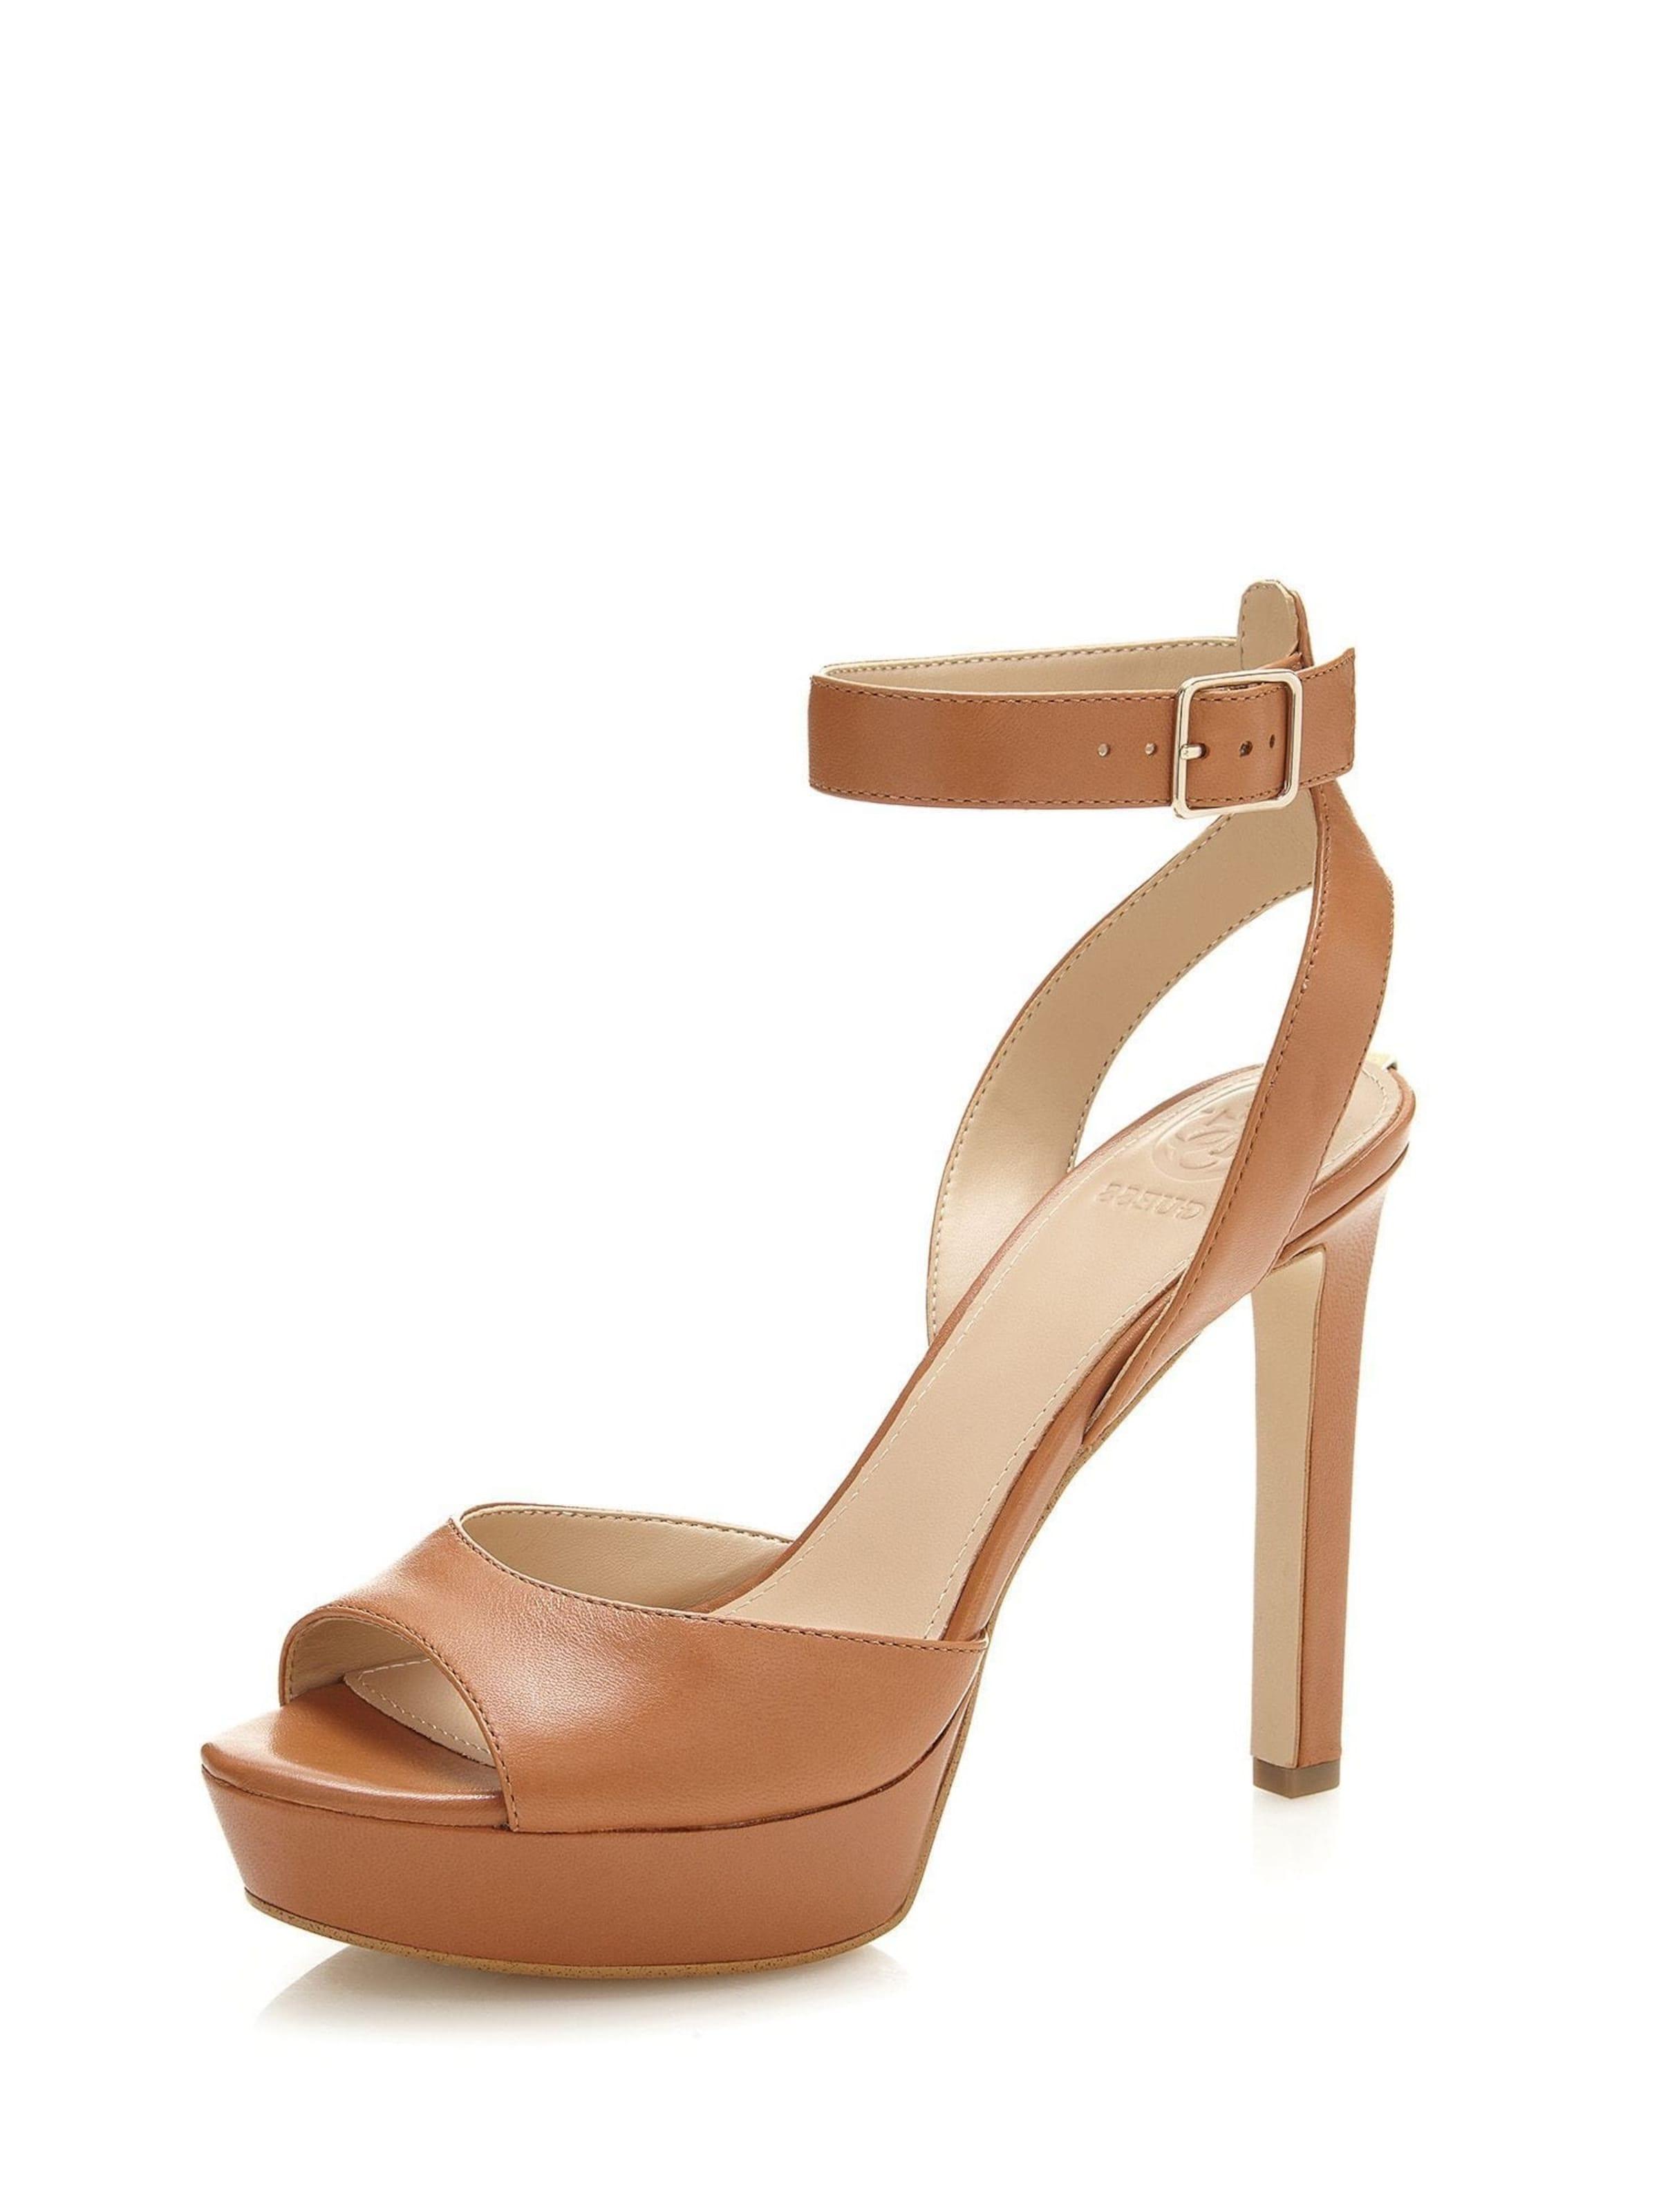 GUESS Sandalette CATORY Verschleißfeste billige Schuhe